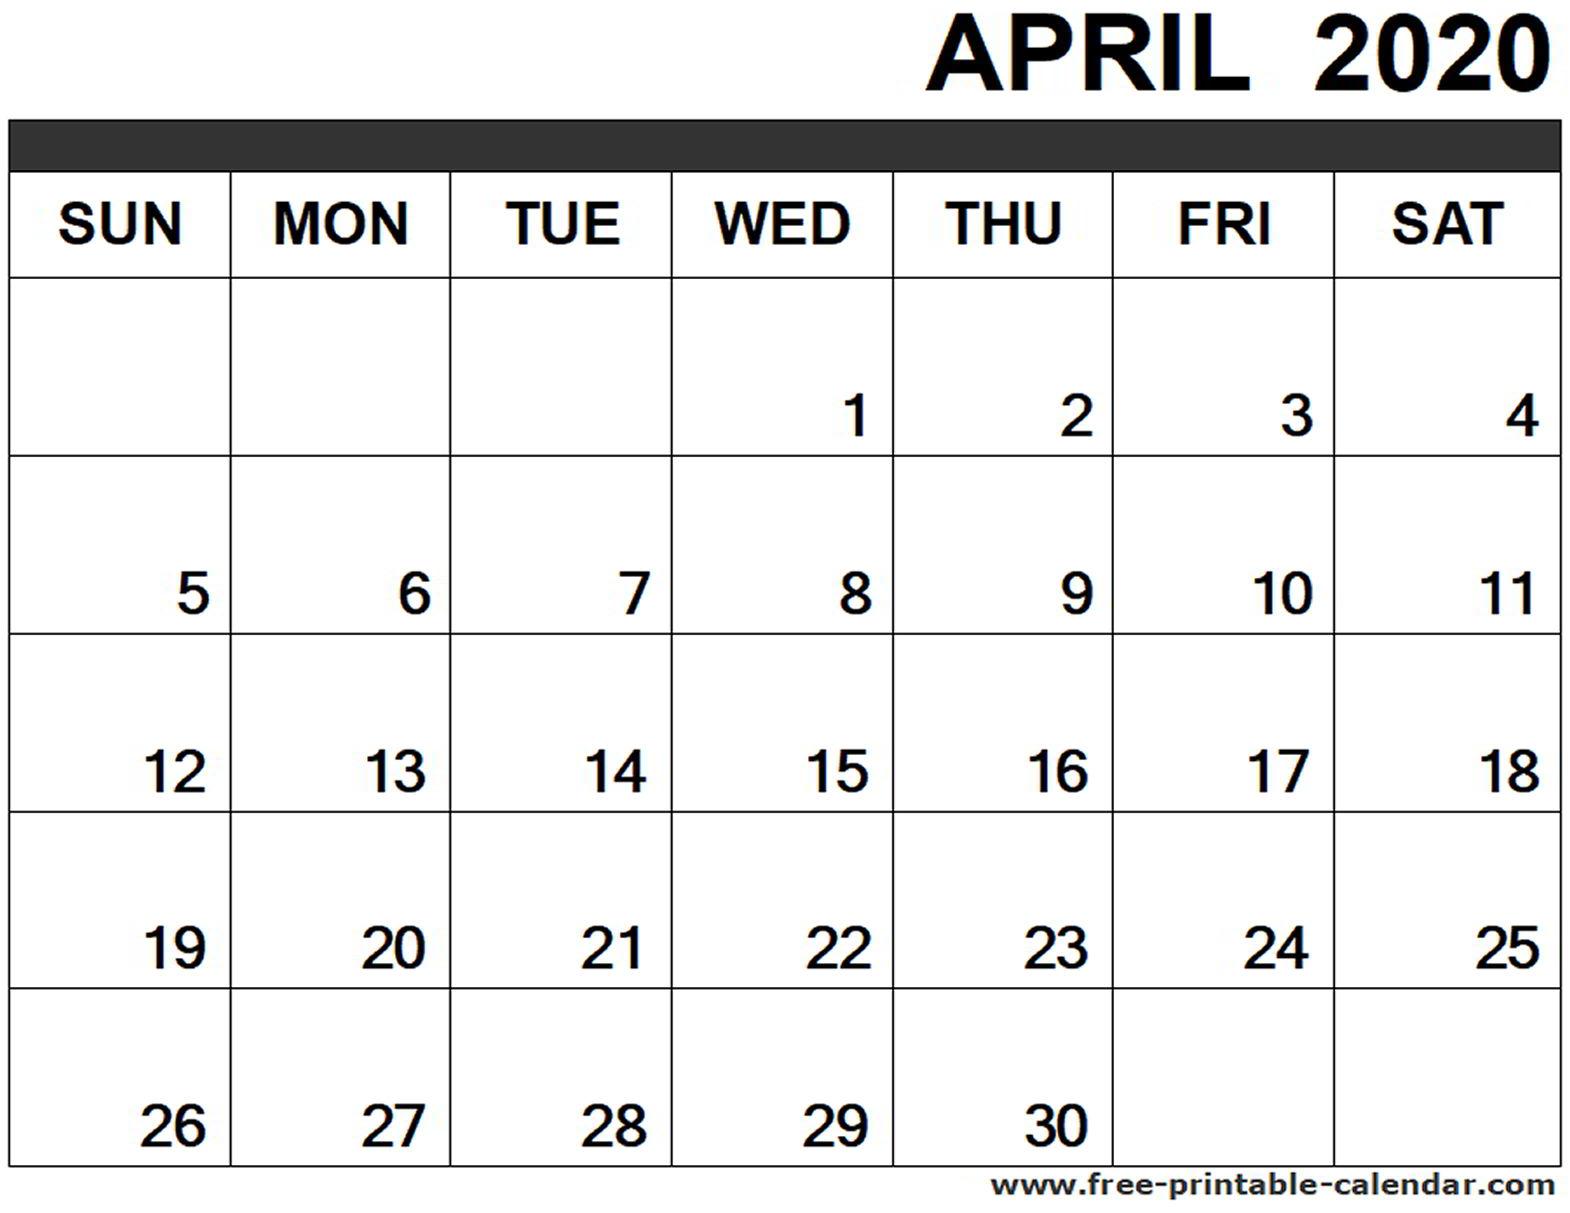 April 2020 Calendar Printable  Freeprintablecalendar intended for Free Printable April 2020 Calendar